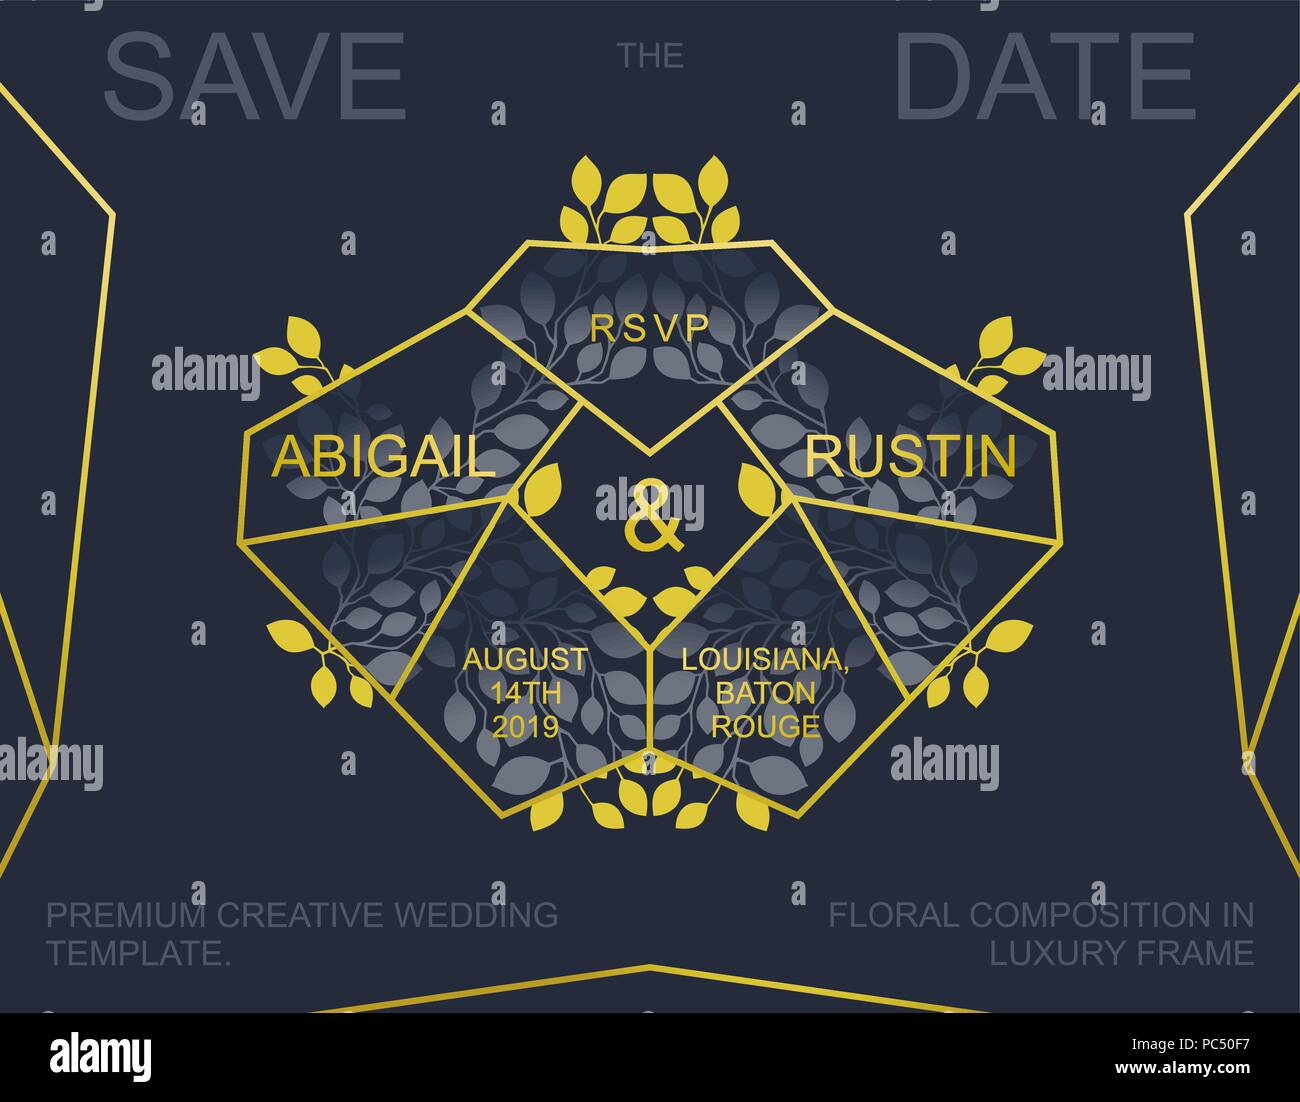 Creative Wedding Invitation Trendy Save The Date Card